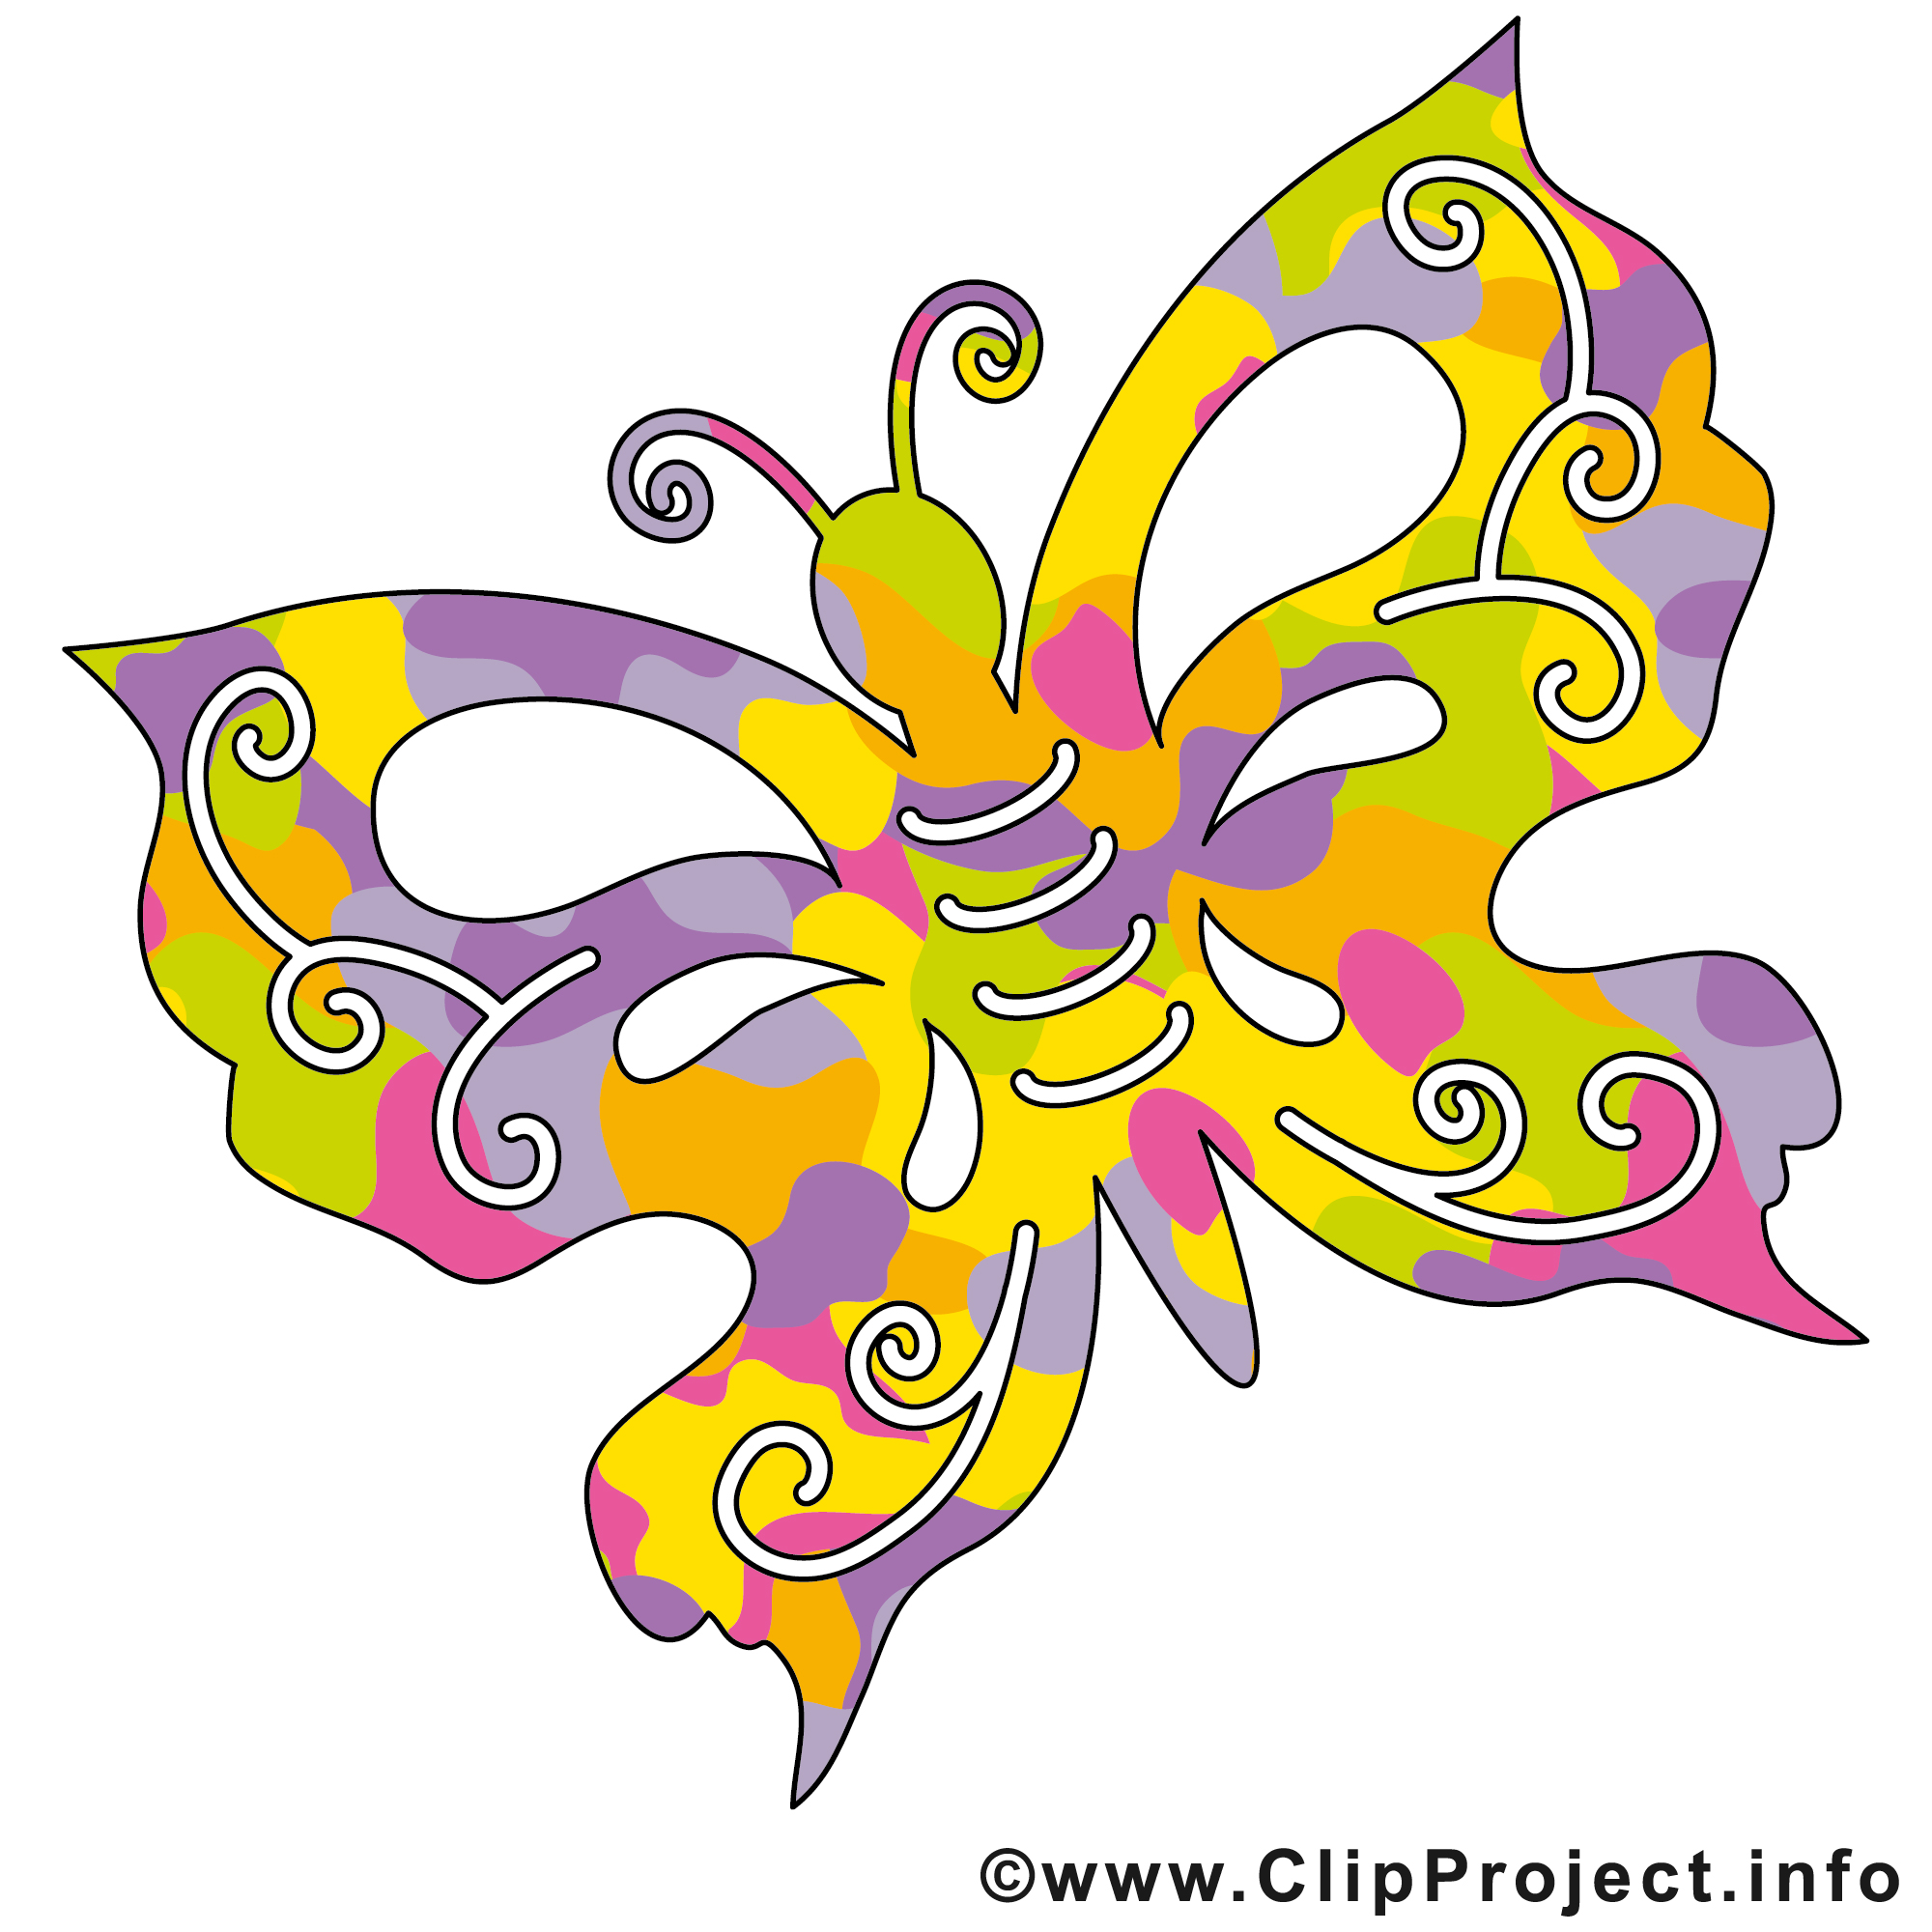 Clipart kostenlos schmetterling vector black and white stock Schmetterling Clip Art - Sommer Bilder gratis vector black and white stock